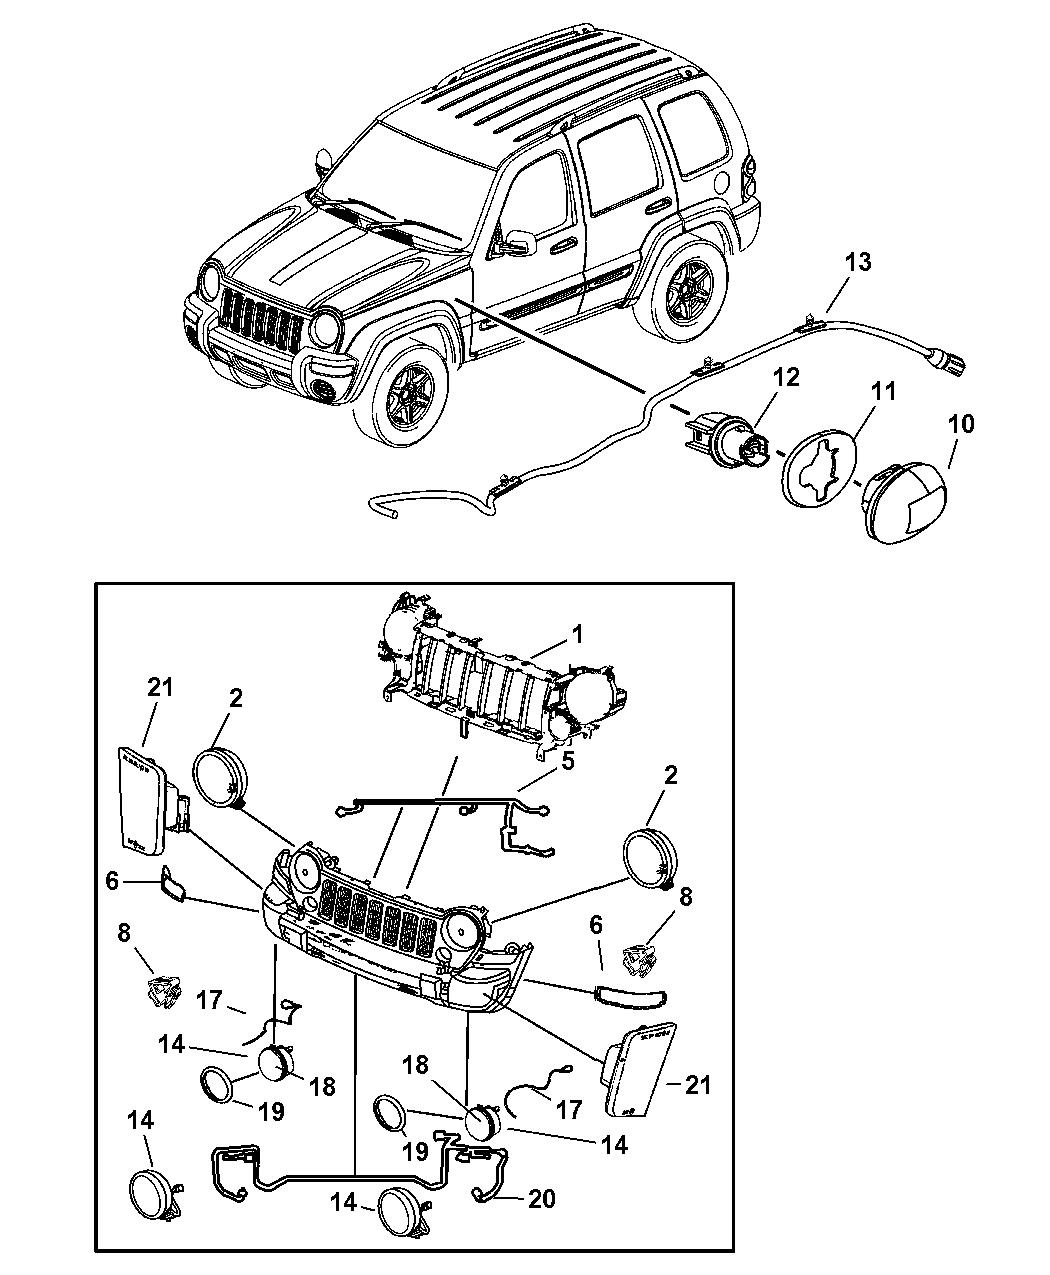 Bulb L Wiring Diagram on bulb parts diagram, bulb socket diagram, bulb wiring pattern, bulb fuse,